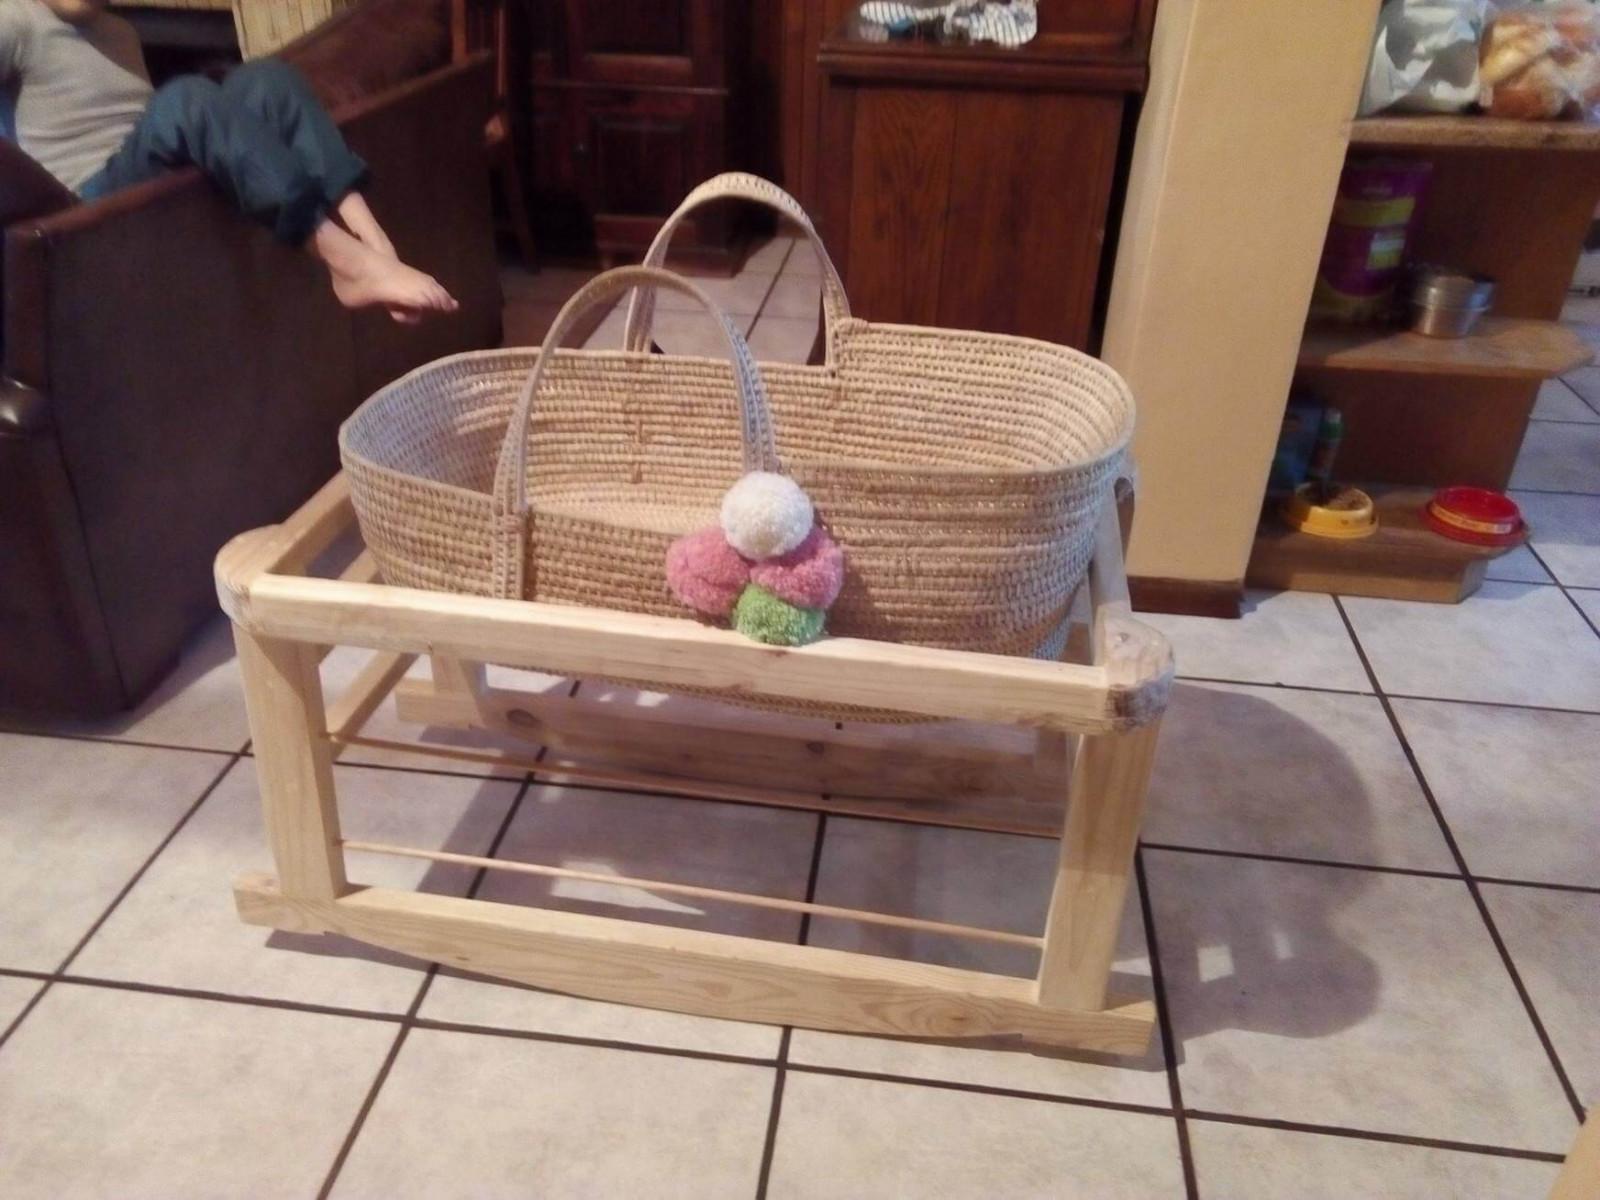 Wooden Baskets Holder Set DIY Pallet Ideas